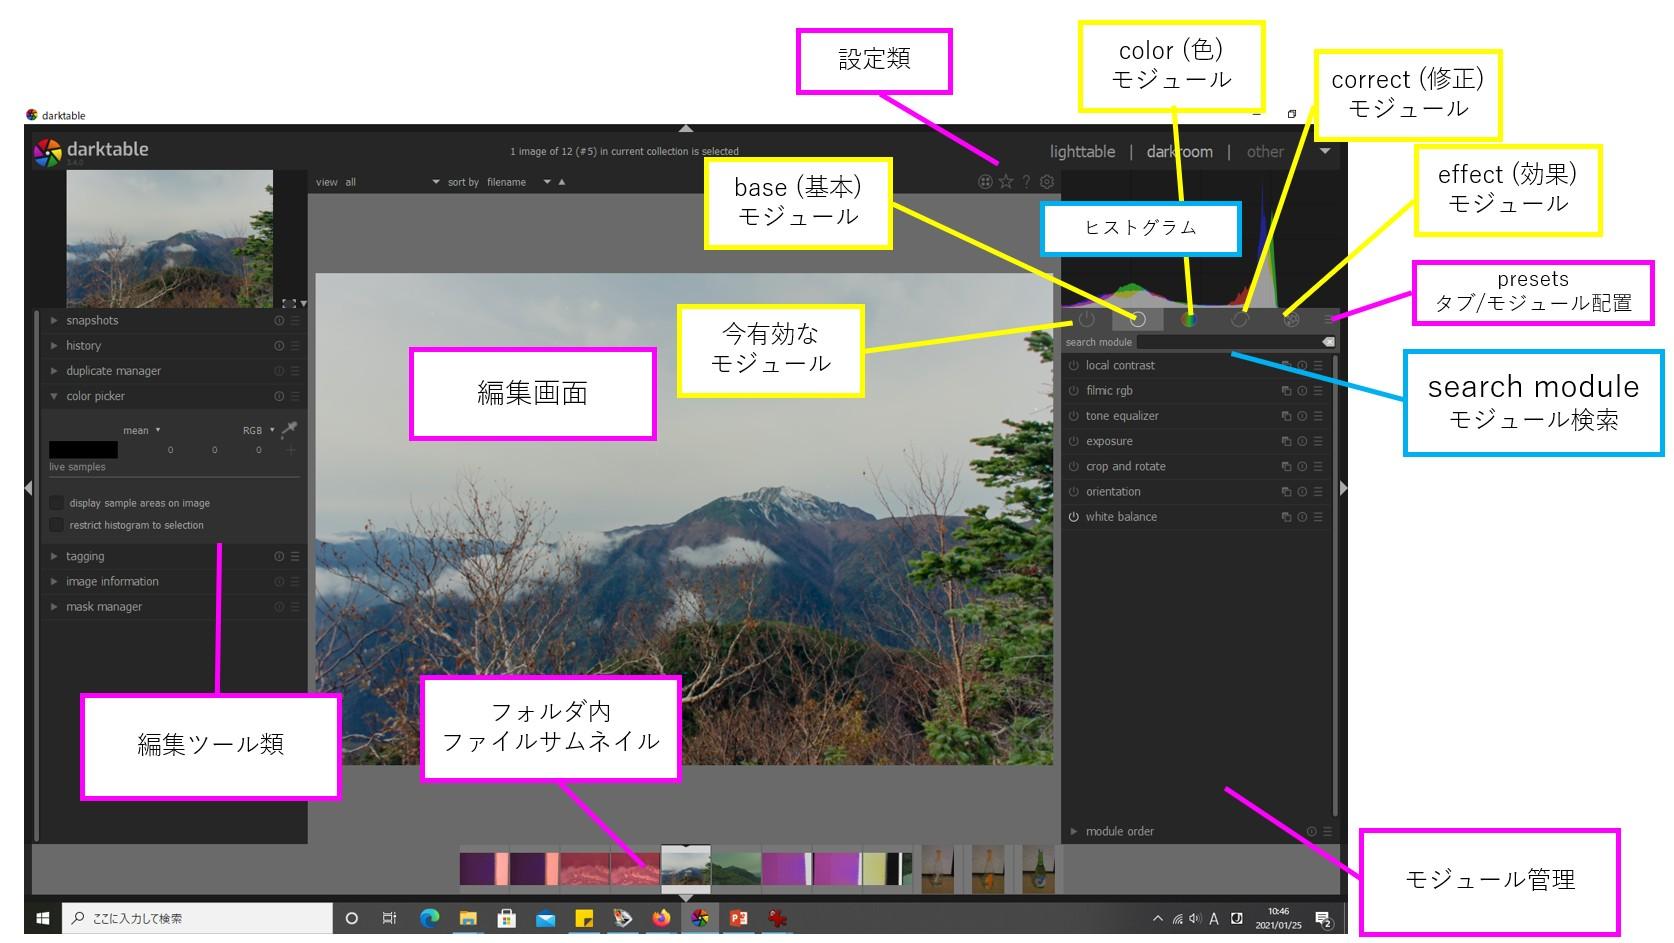 f:id:yasuo_ssi:20210125105245j:plain